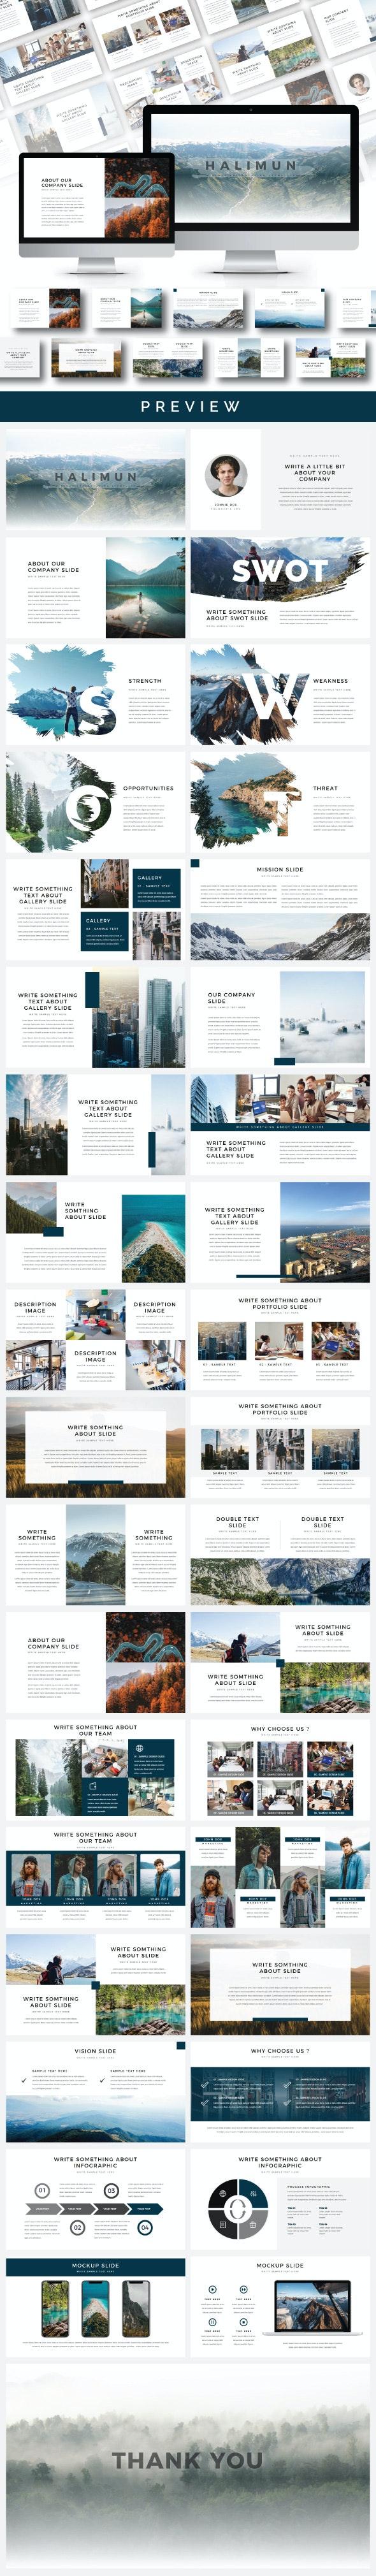 Halimun Keynote Templates - Business Keynote Templates